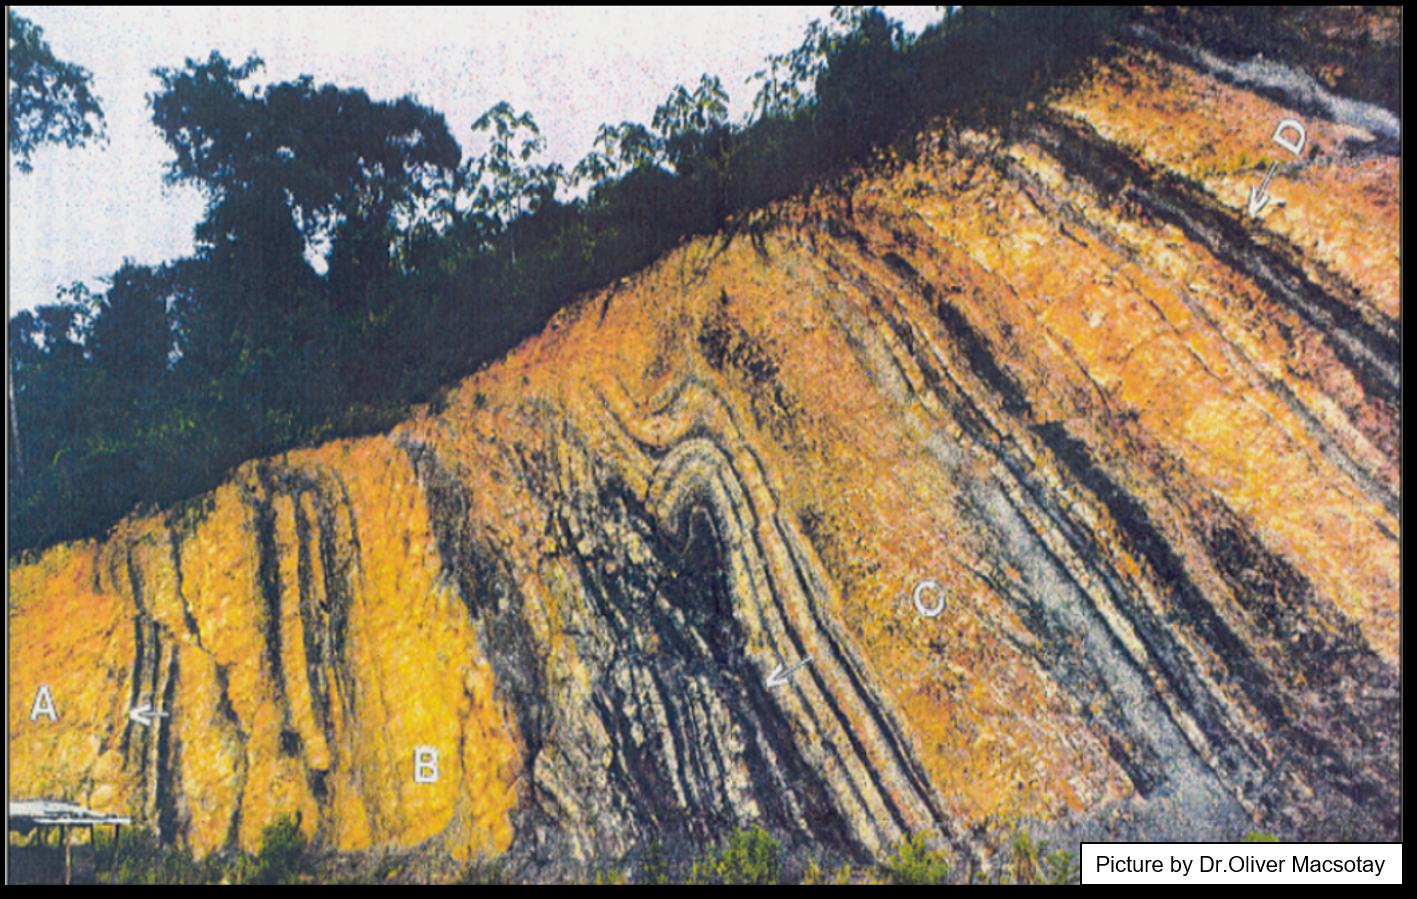 Early Cretaceous Conomita outcrop: structural analysis of syn-sedimentary gravity-driven deformations (NE Venezuela)